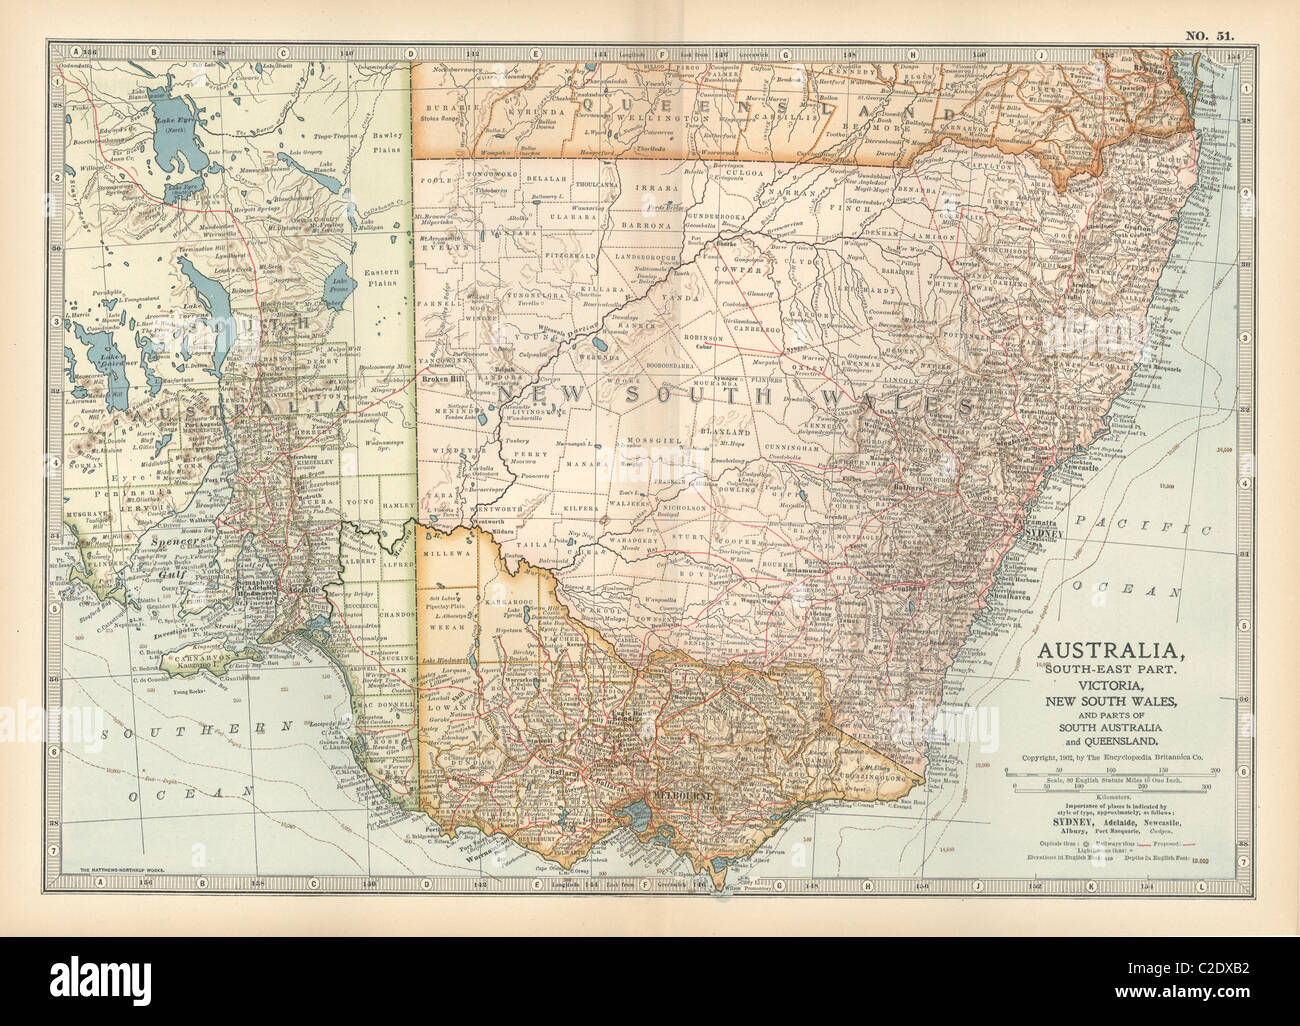 Map of southeast Australia - Stock Image